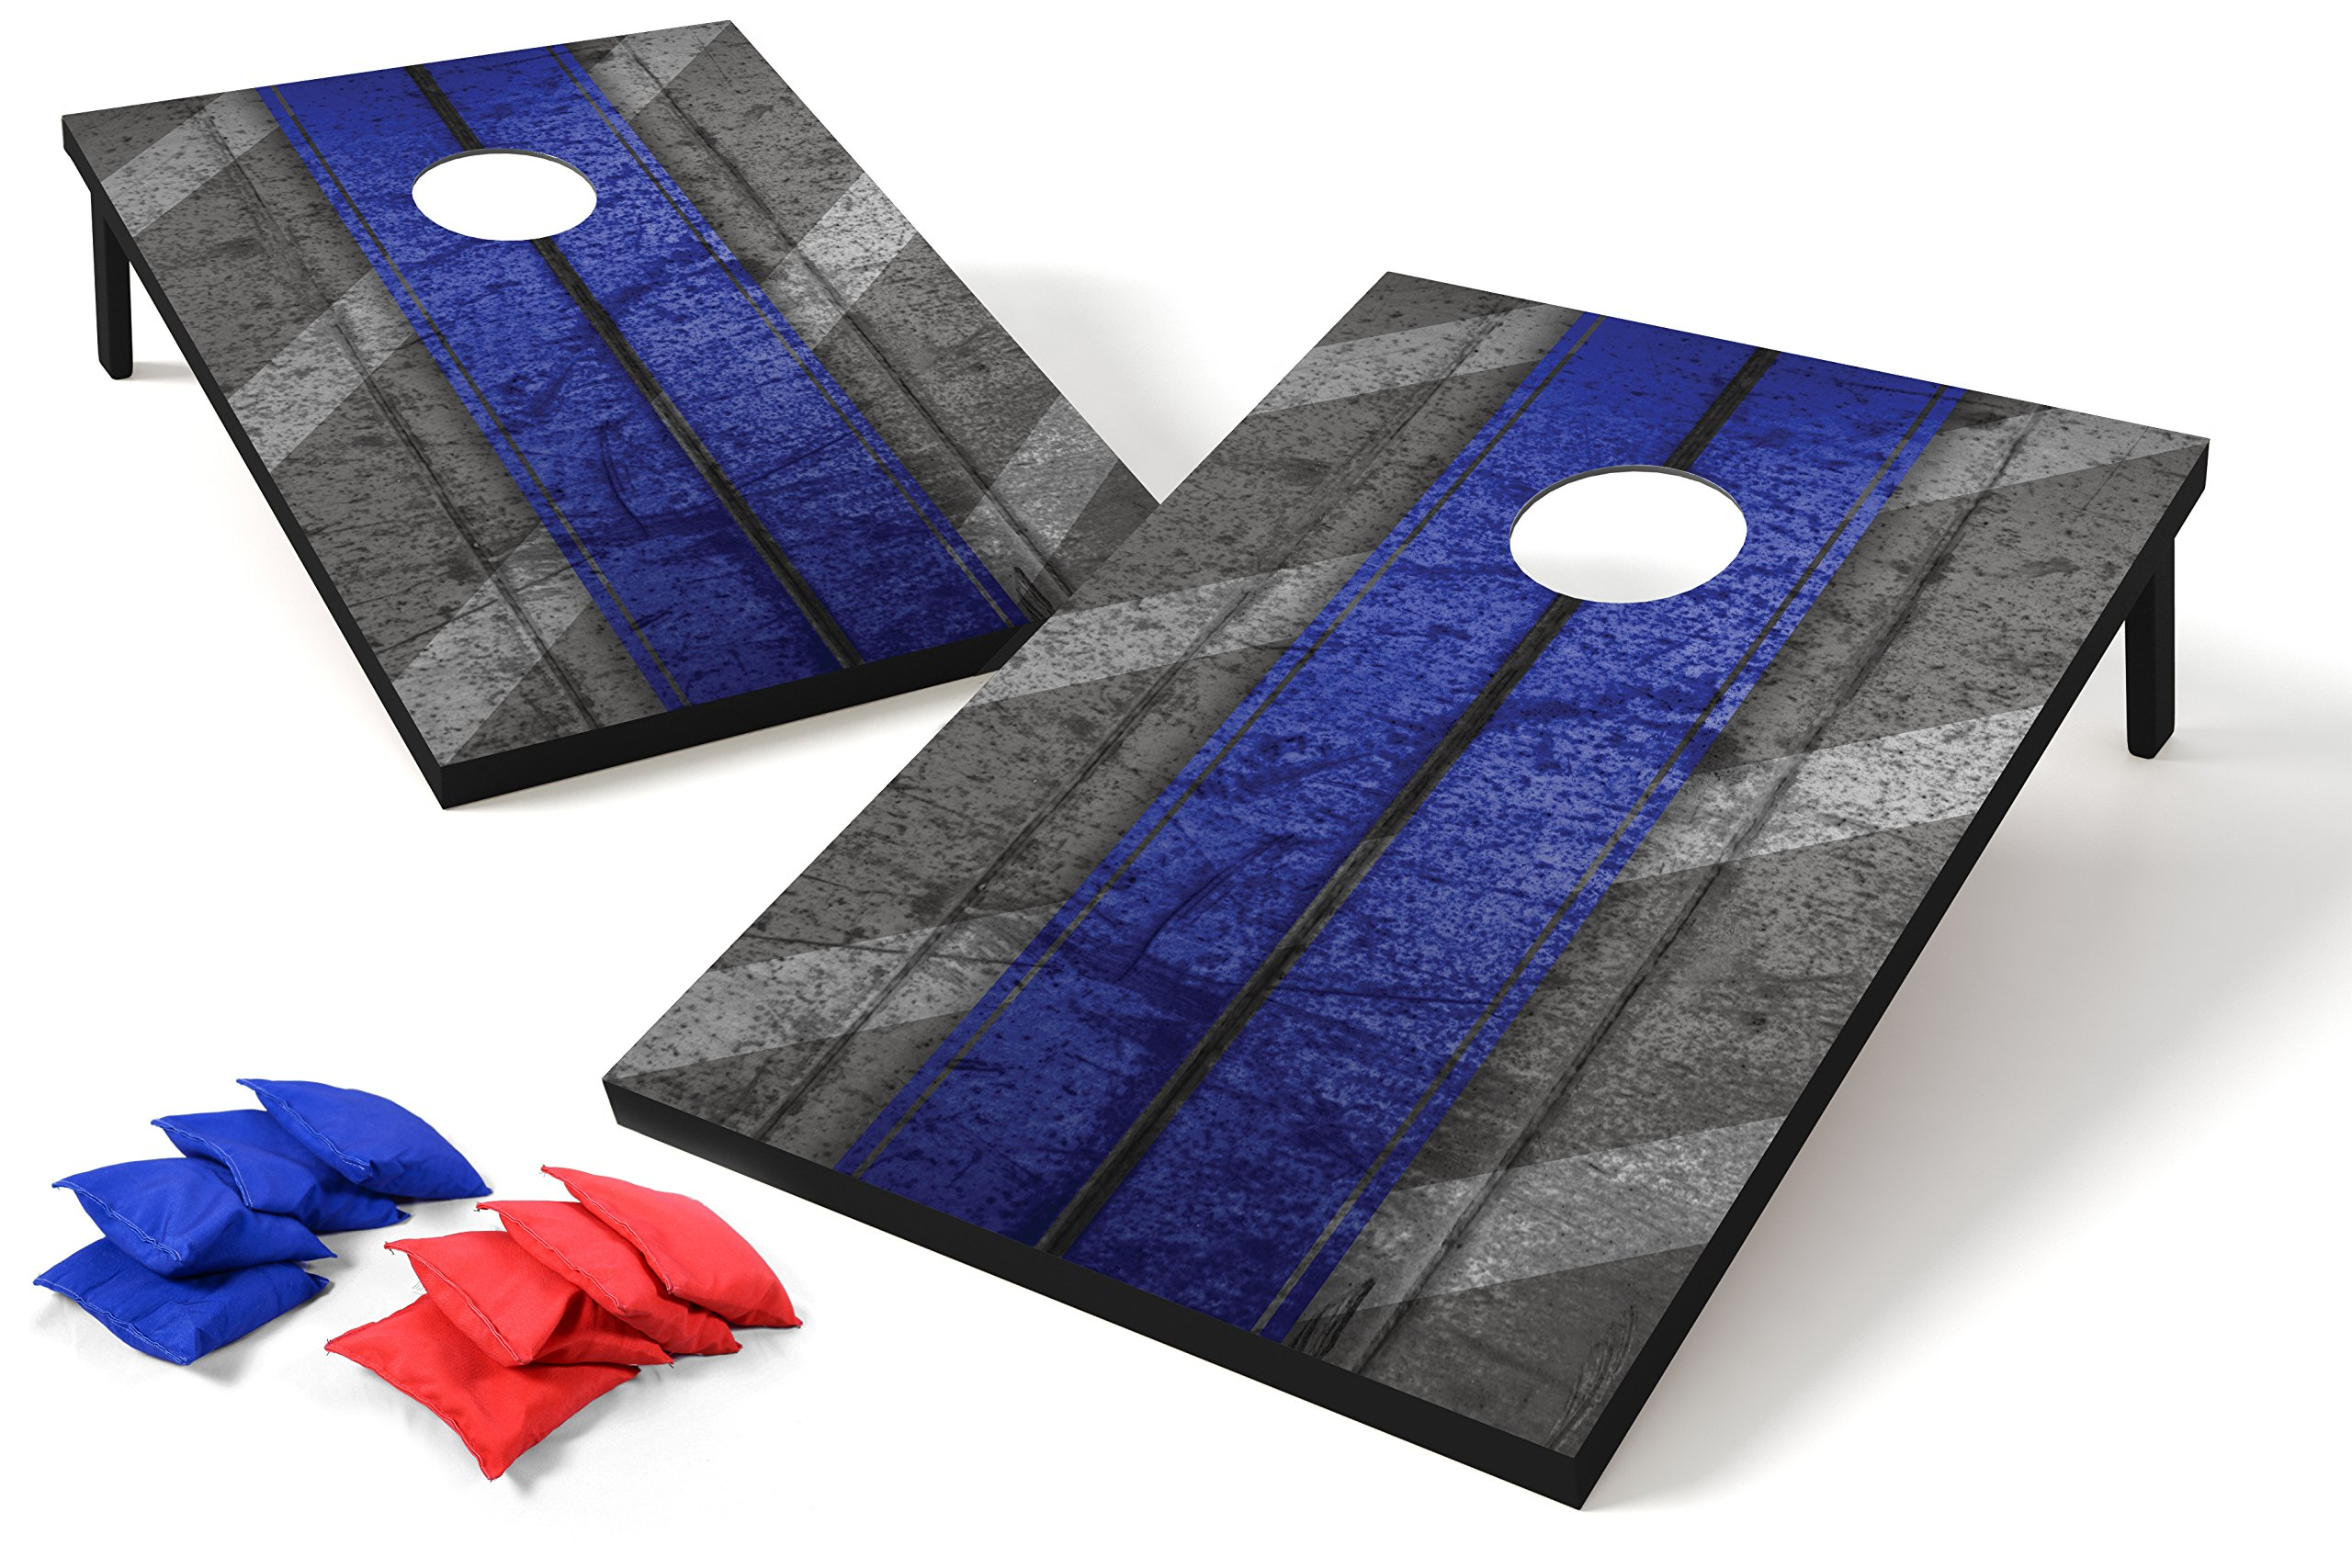 Backyard Champs Tailgate MDF Cornhole with 8 Regulation Bean Bag Set - 2 x 3 Feet, Blue